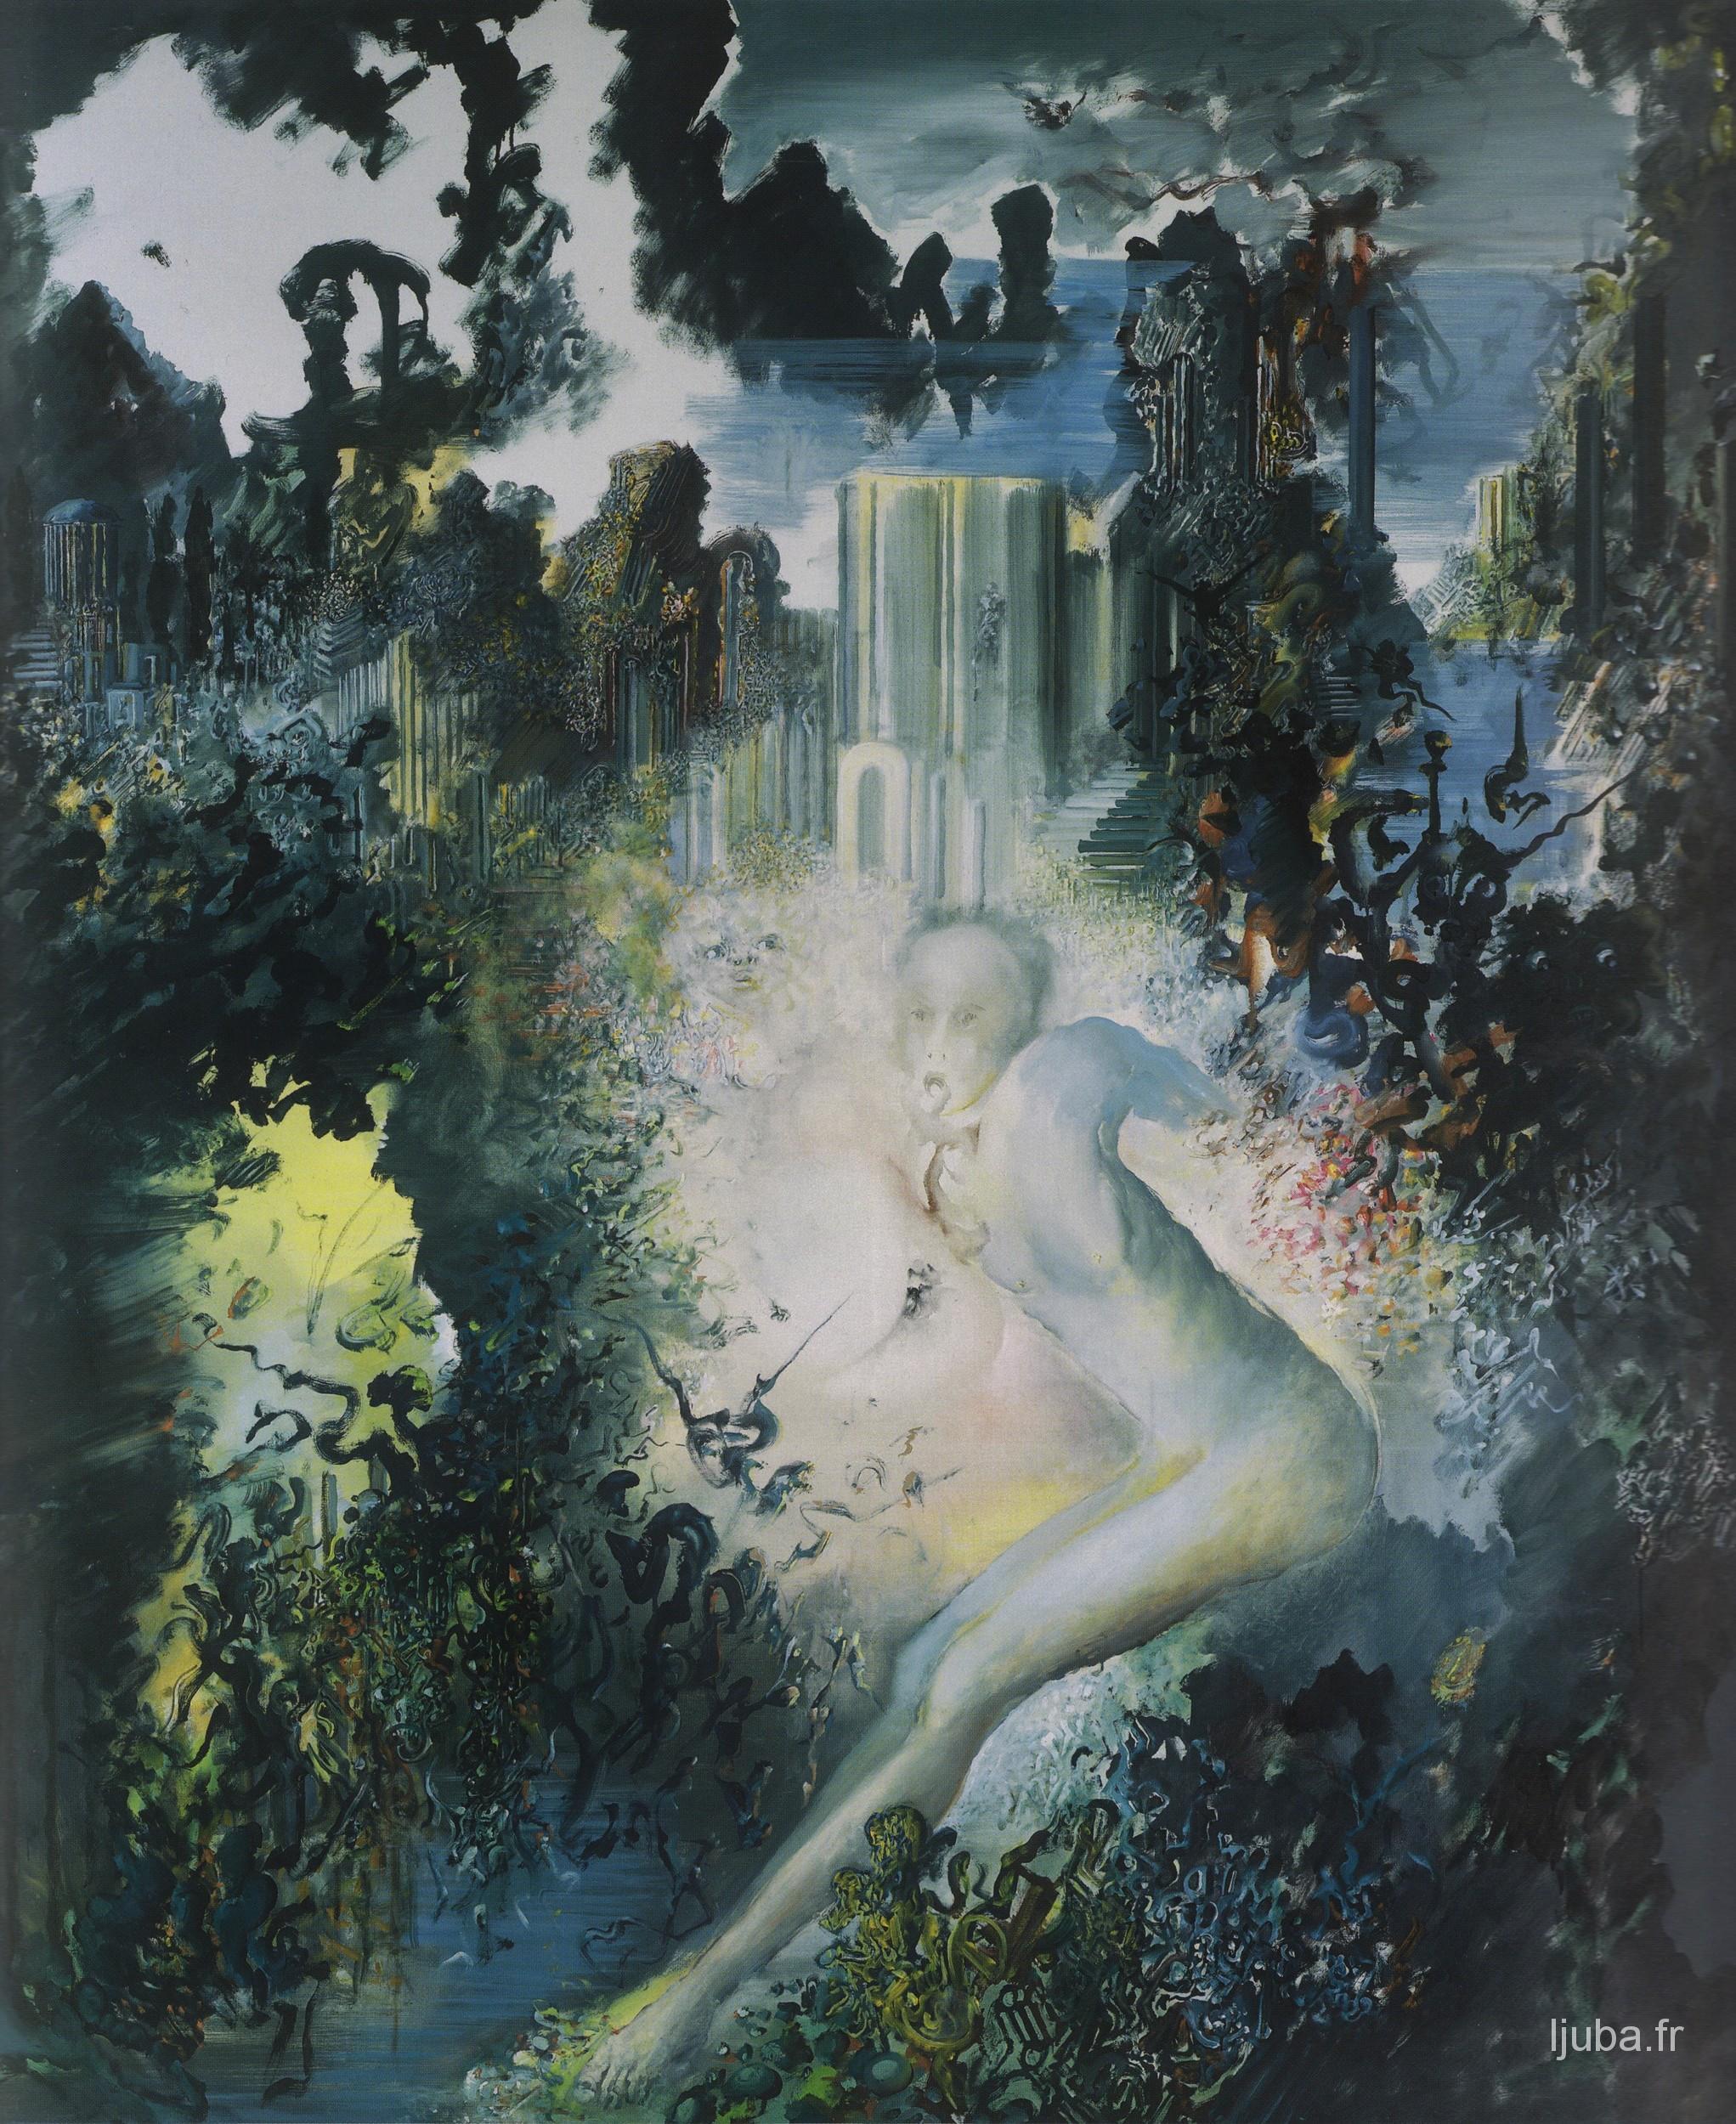 Ljuba Popovic - 1992-91, Cauchemar II, Le réveil